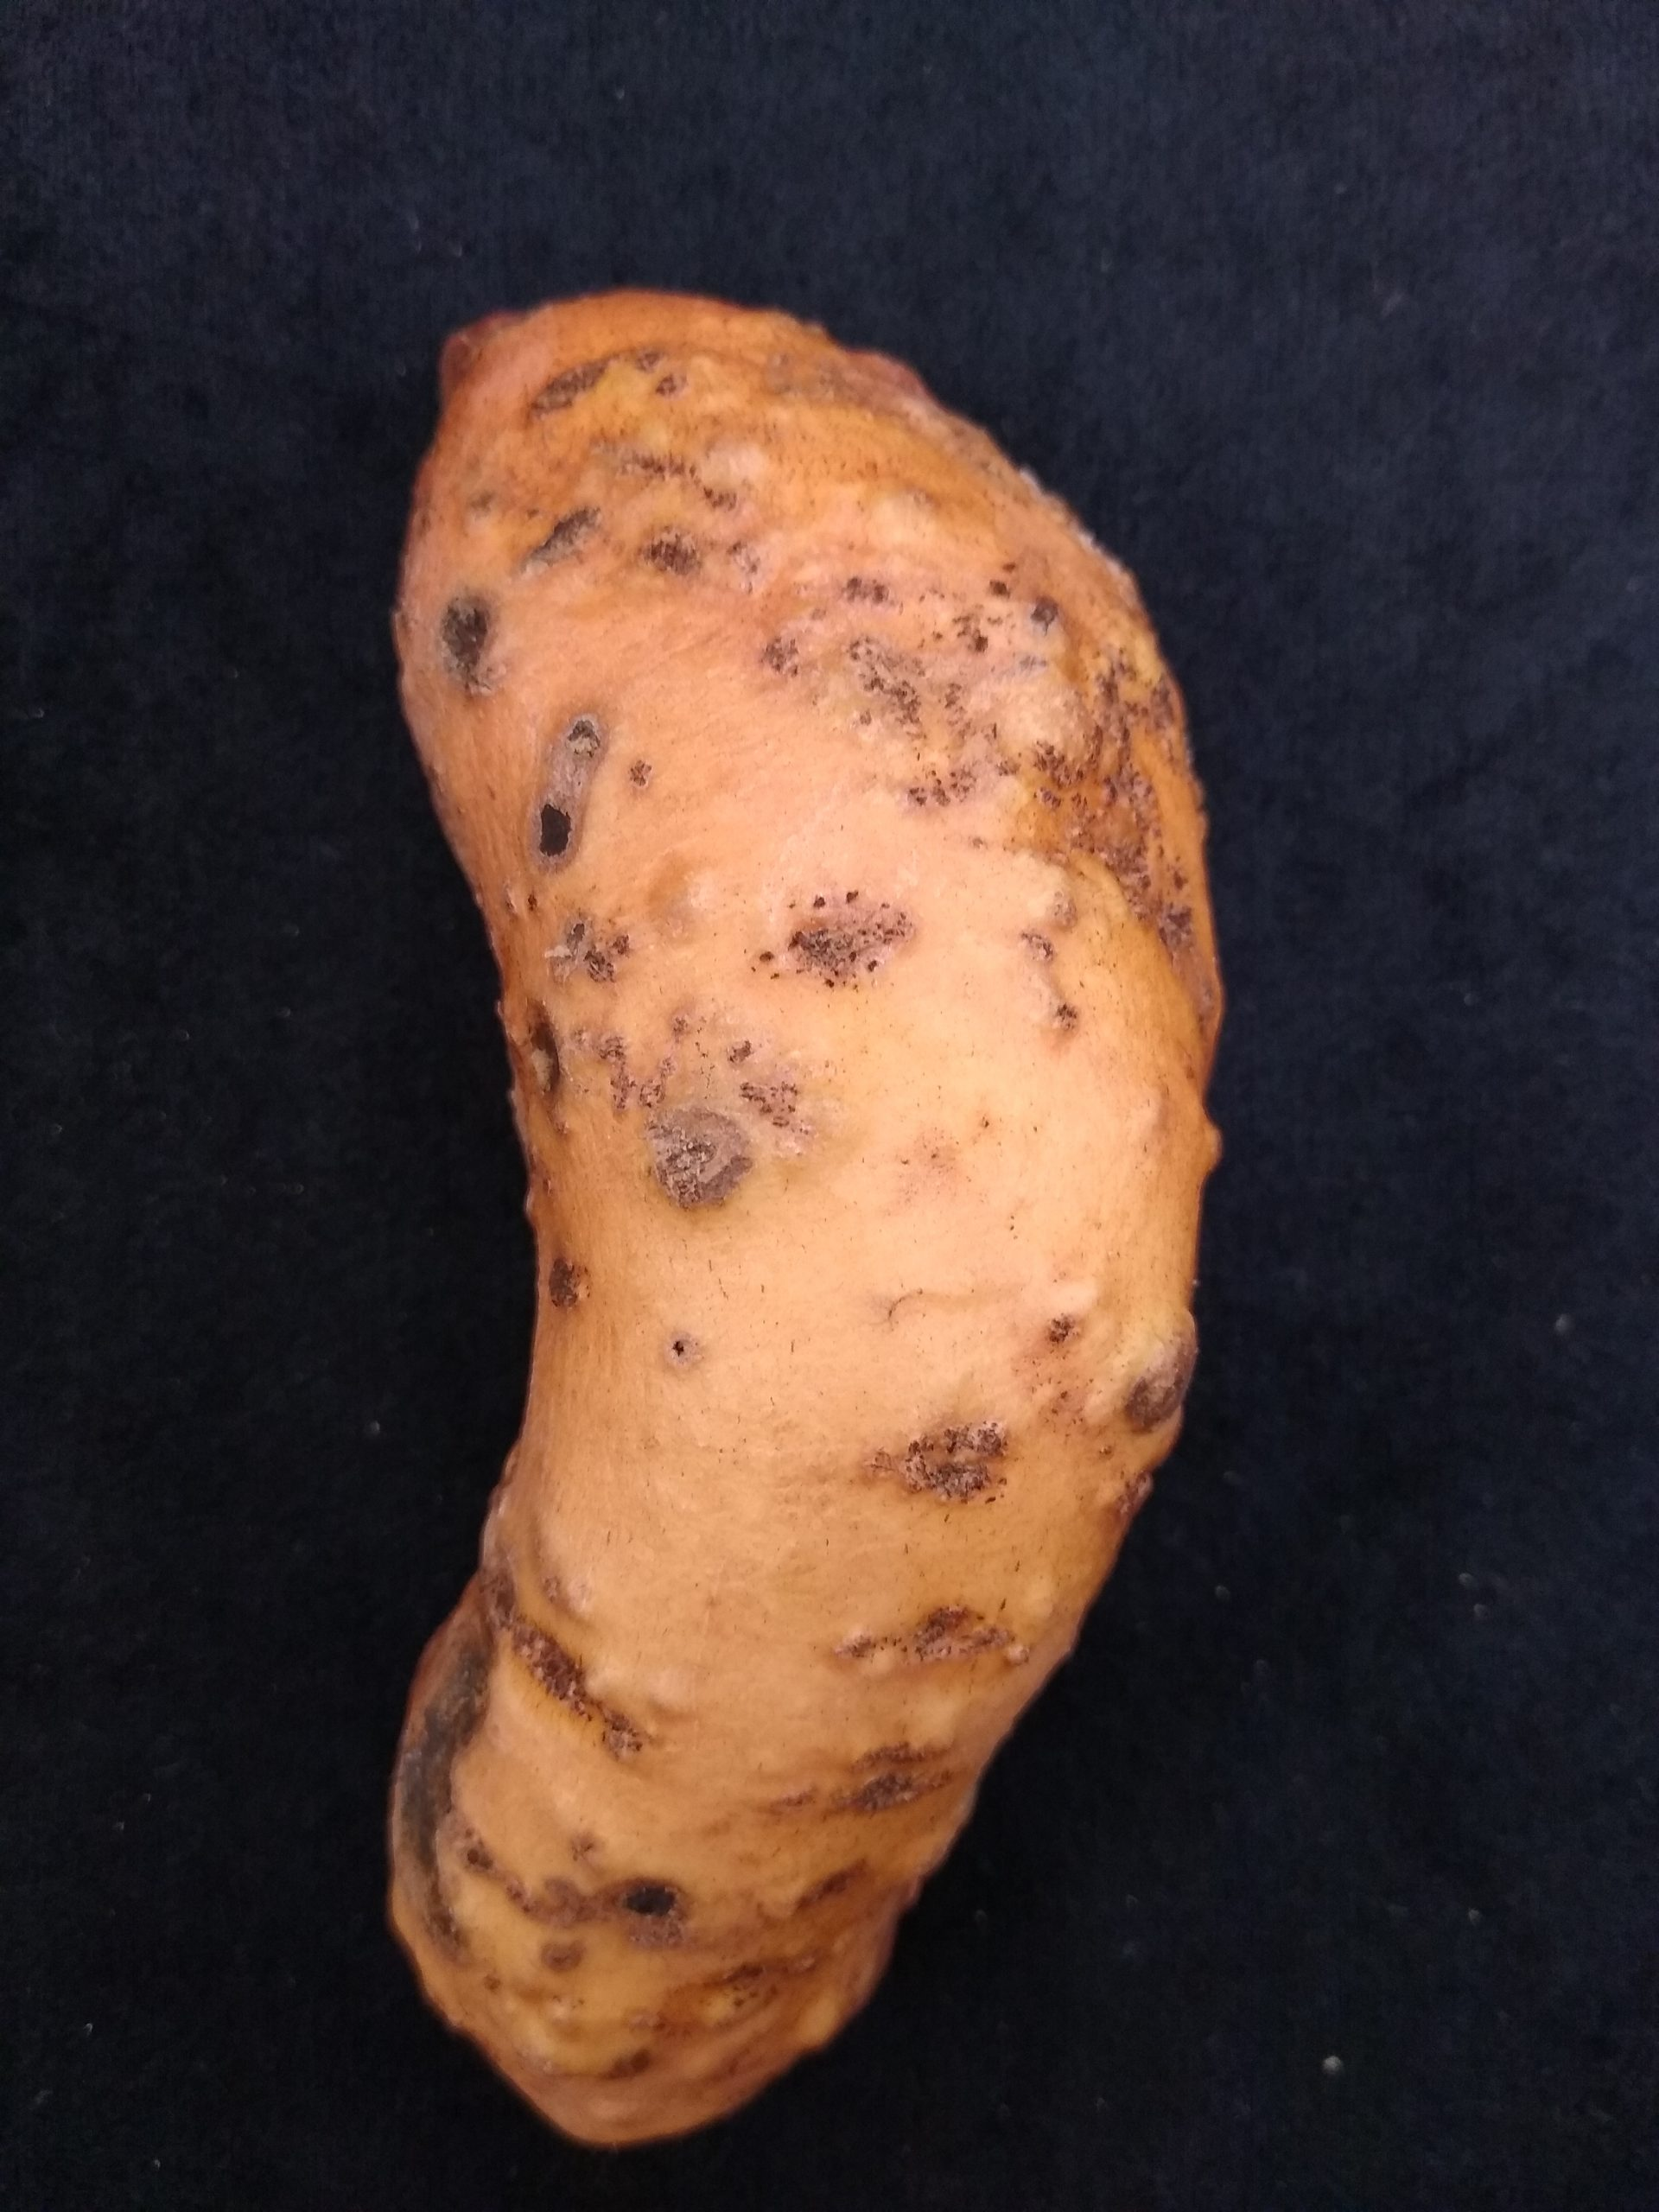 Nematode damage on a sweetpotato